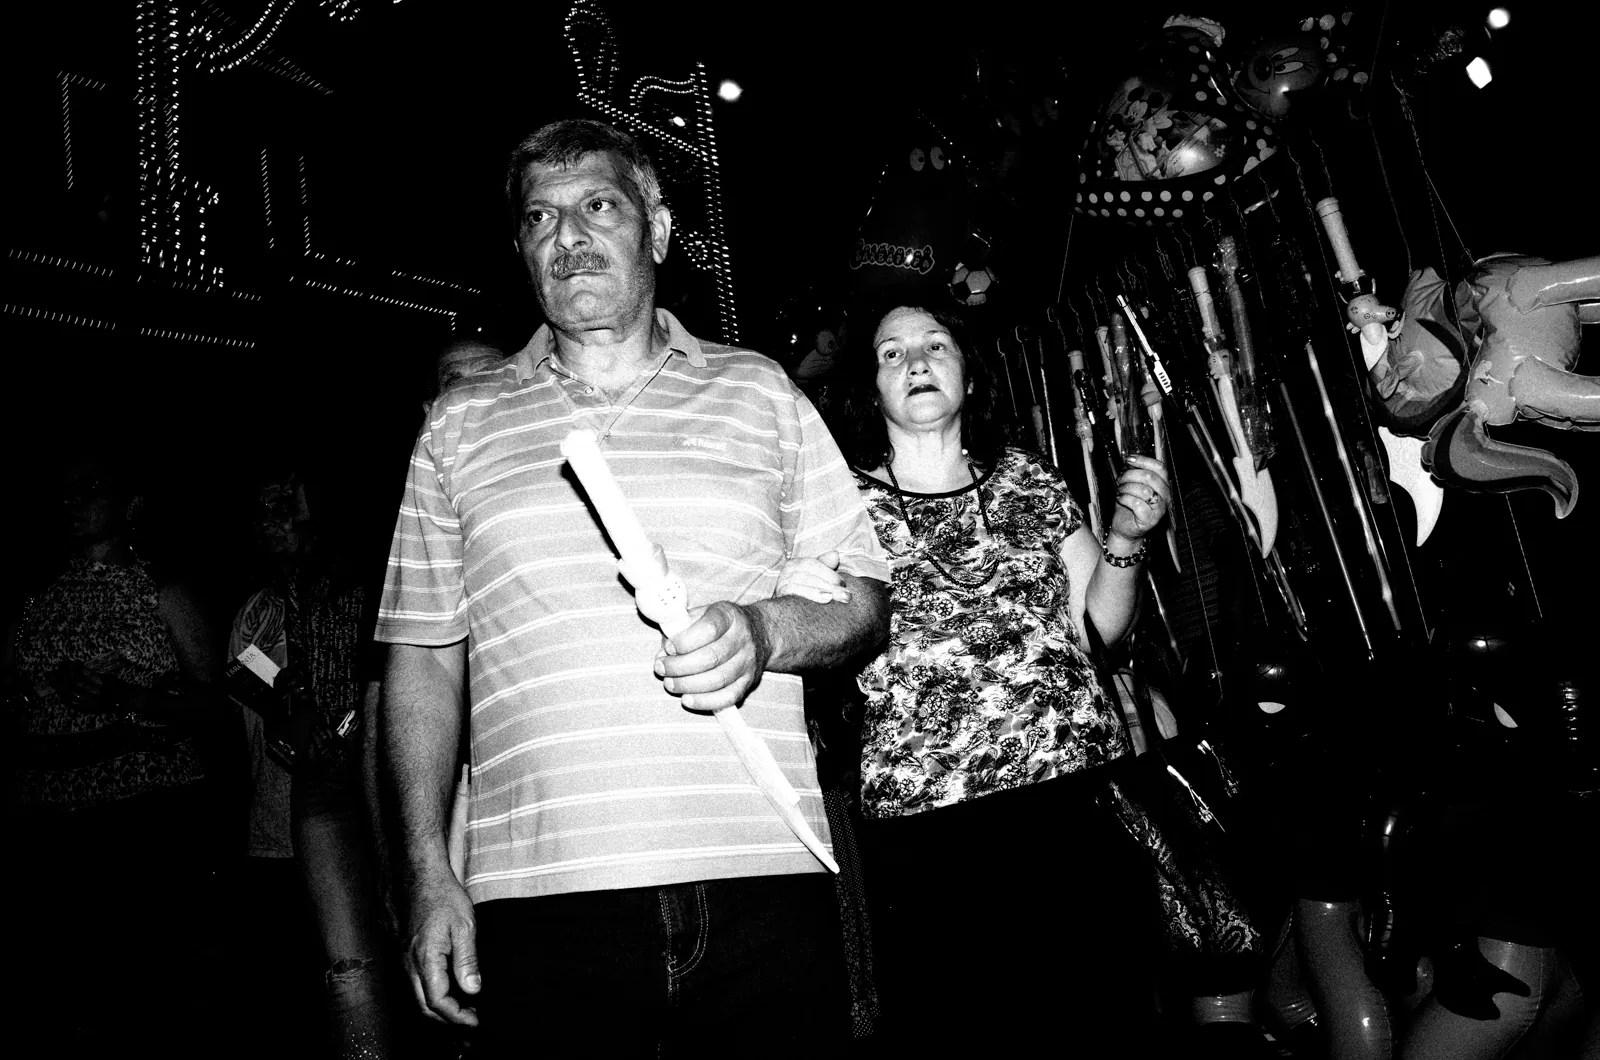 R0020032 - Una Istintiva Sessione Notturna • Street Photography Night Session a Palagonia - Sicilia - fotostreet.it